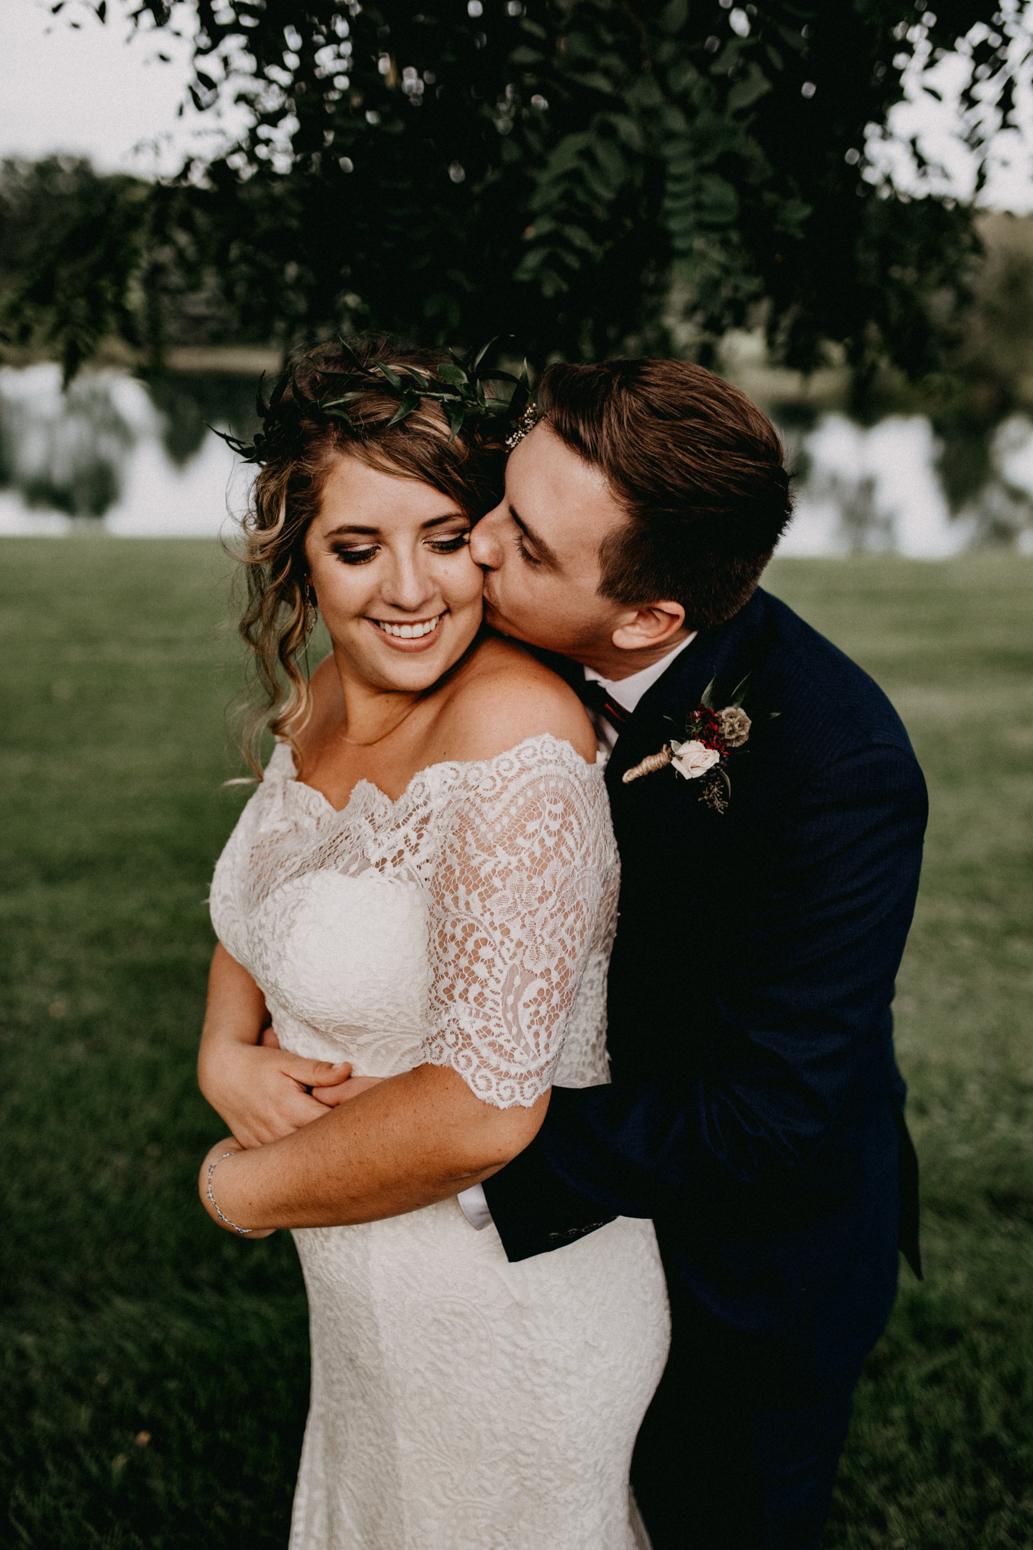 Rochester, NY Wedding Photographer (109 of 149).jpg